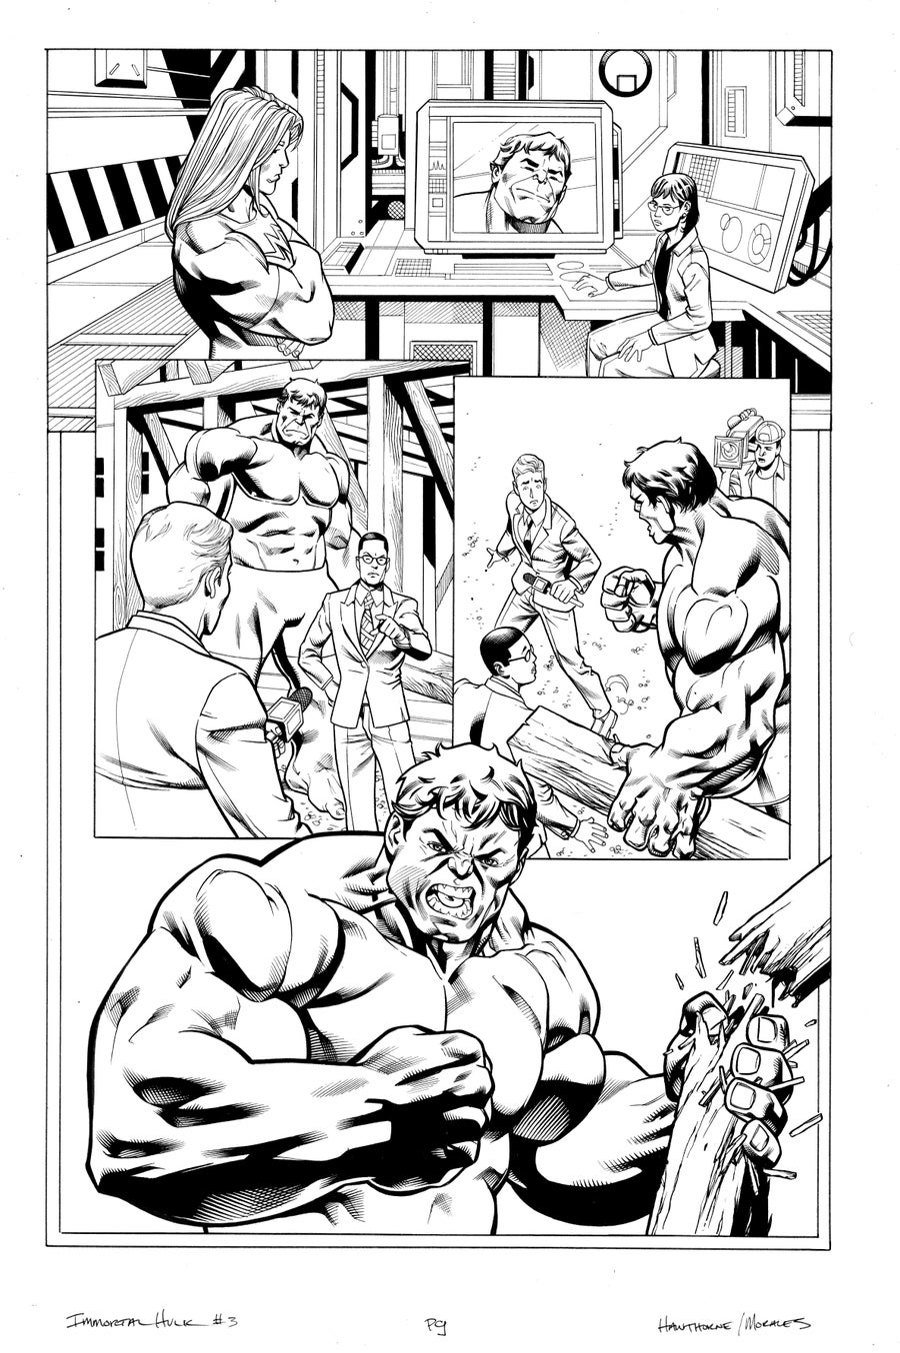 Image of Immortal Hulk (2020) #35 PG 16